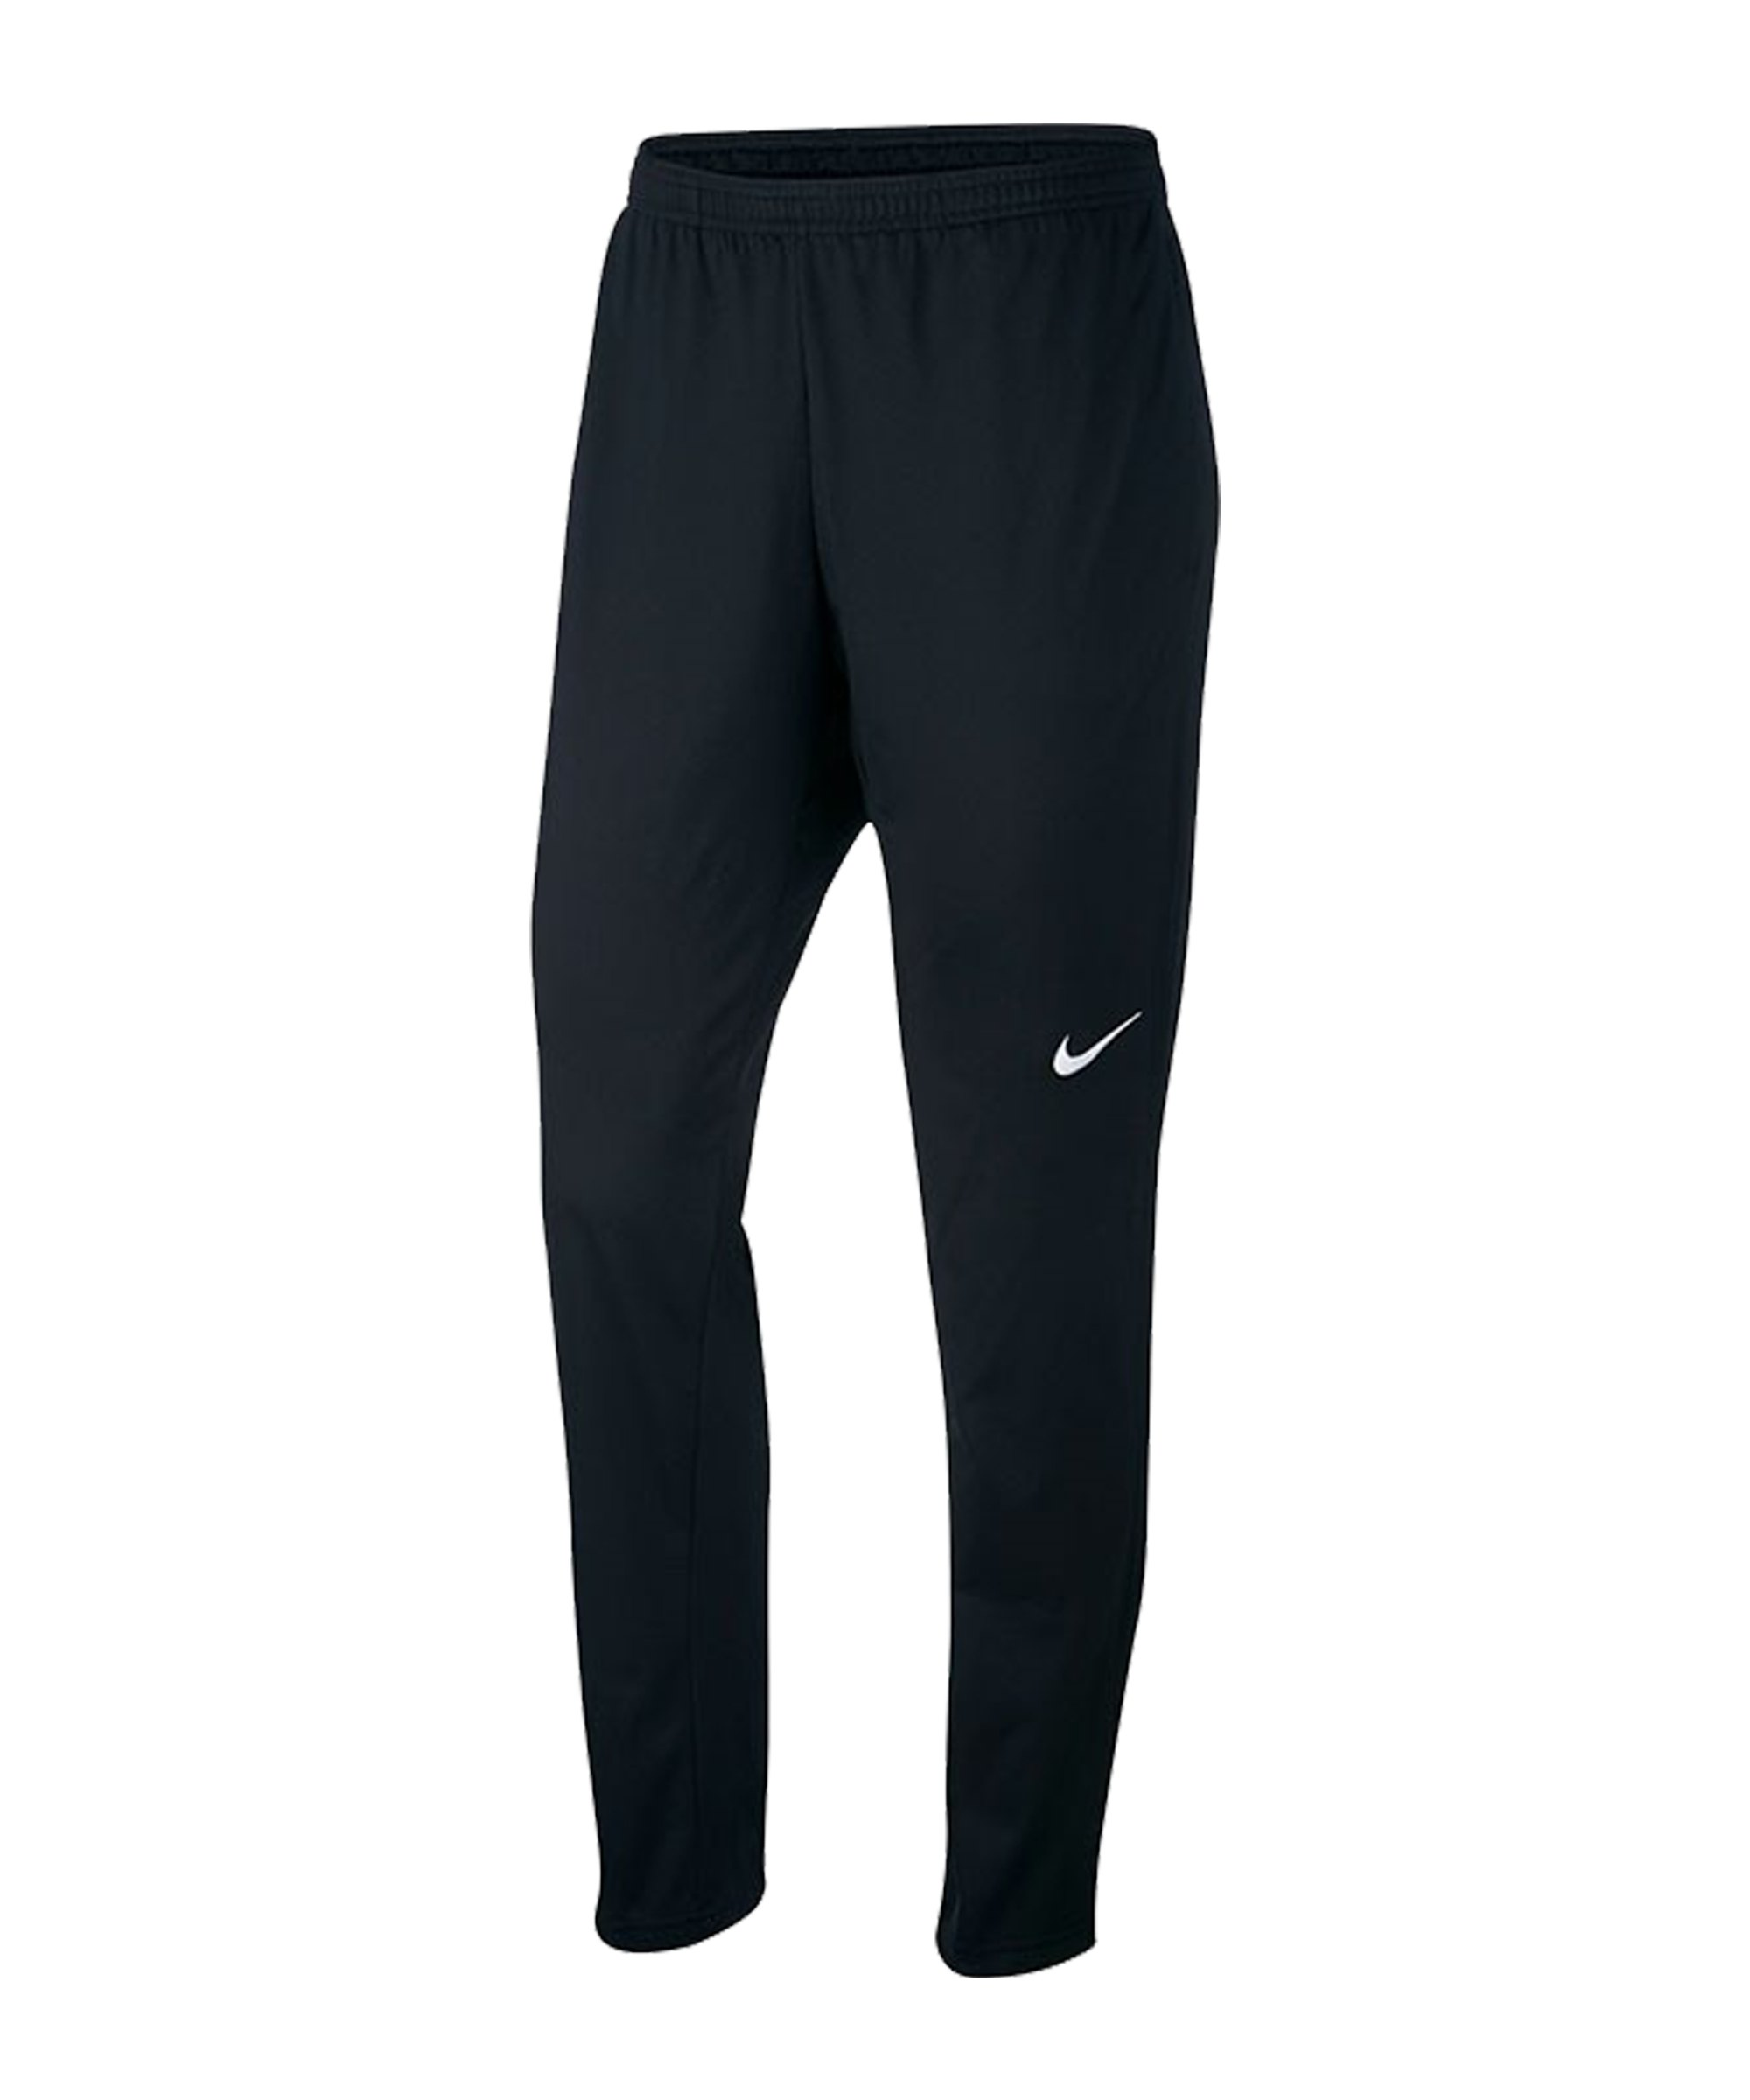 Nike Academy 18 Tech Trainingshose Damen F010 - schwarz